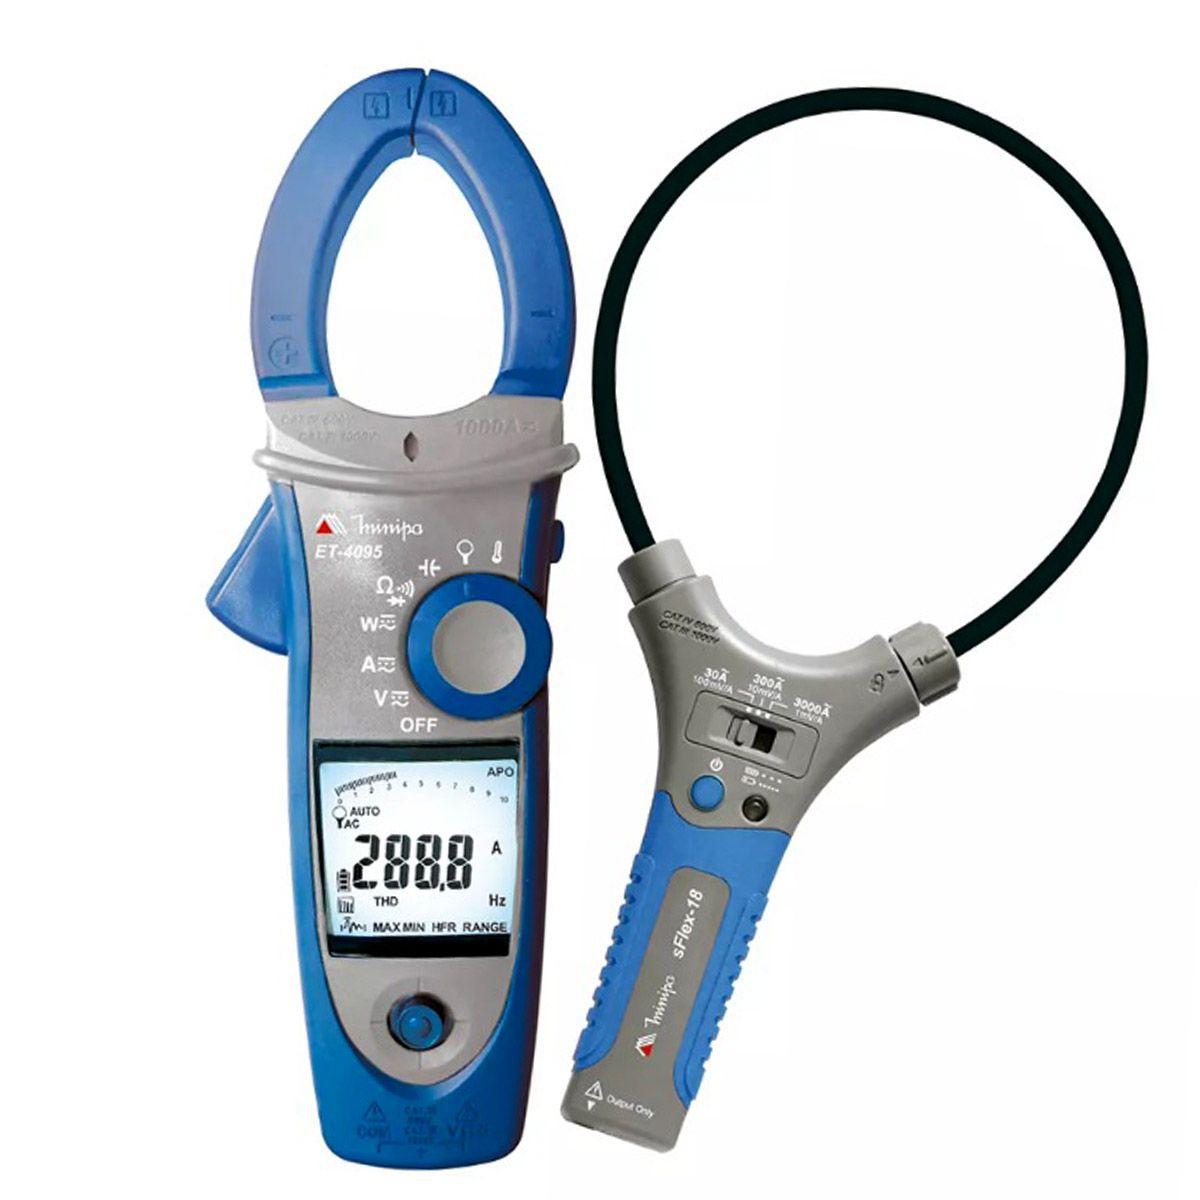 ALICATE Wattímetro Trifásico/Fasímetro CAT IV TRUE RMS 3000 A C/ NCV, INRUSH, THD Minipa ET-4095  - MRE Ferramentas